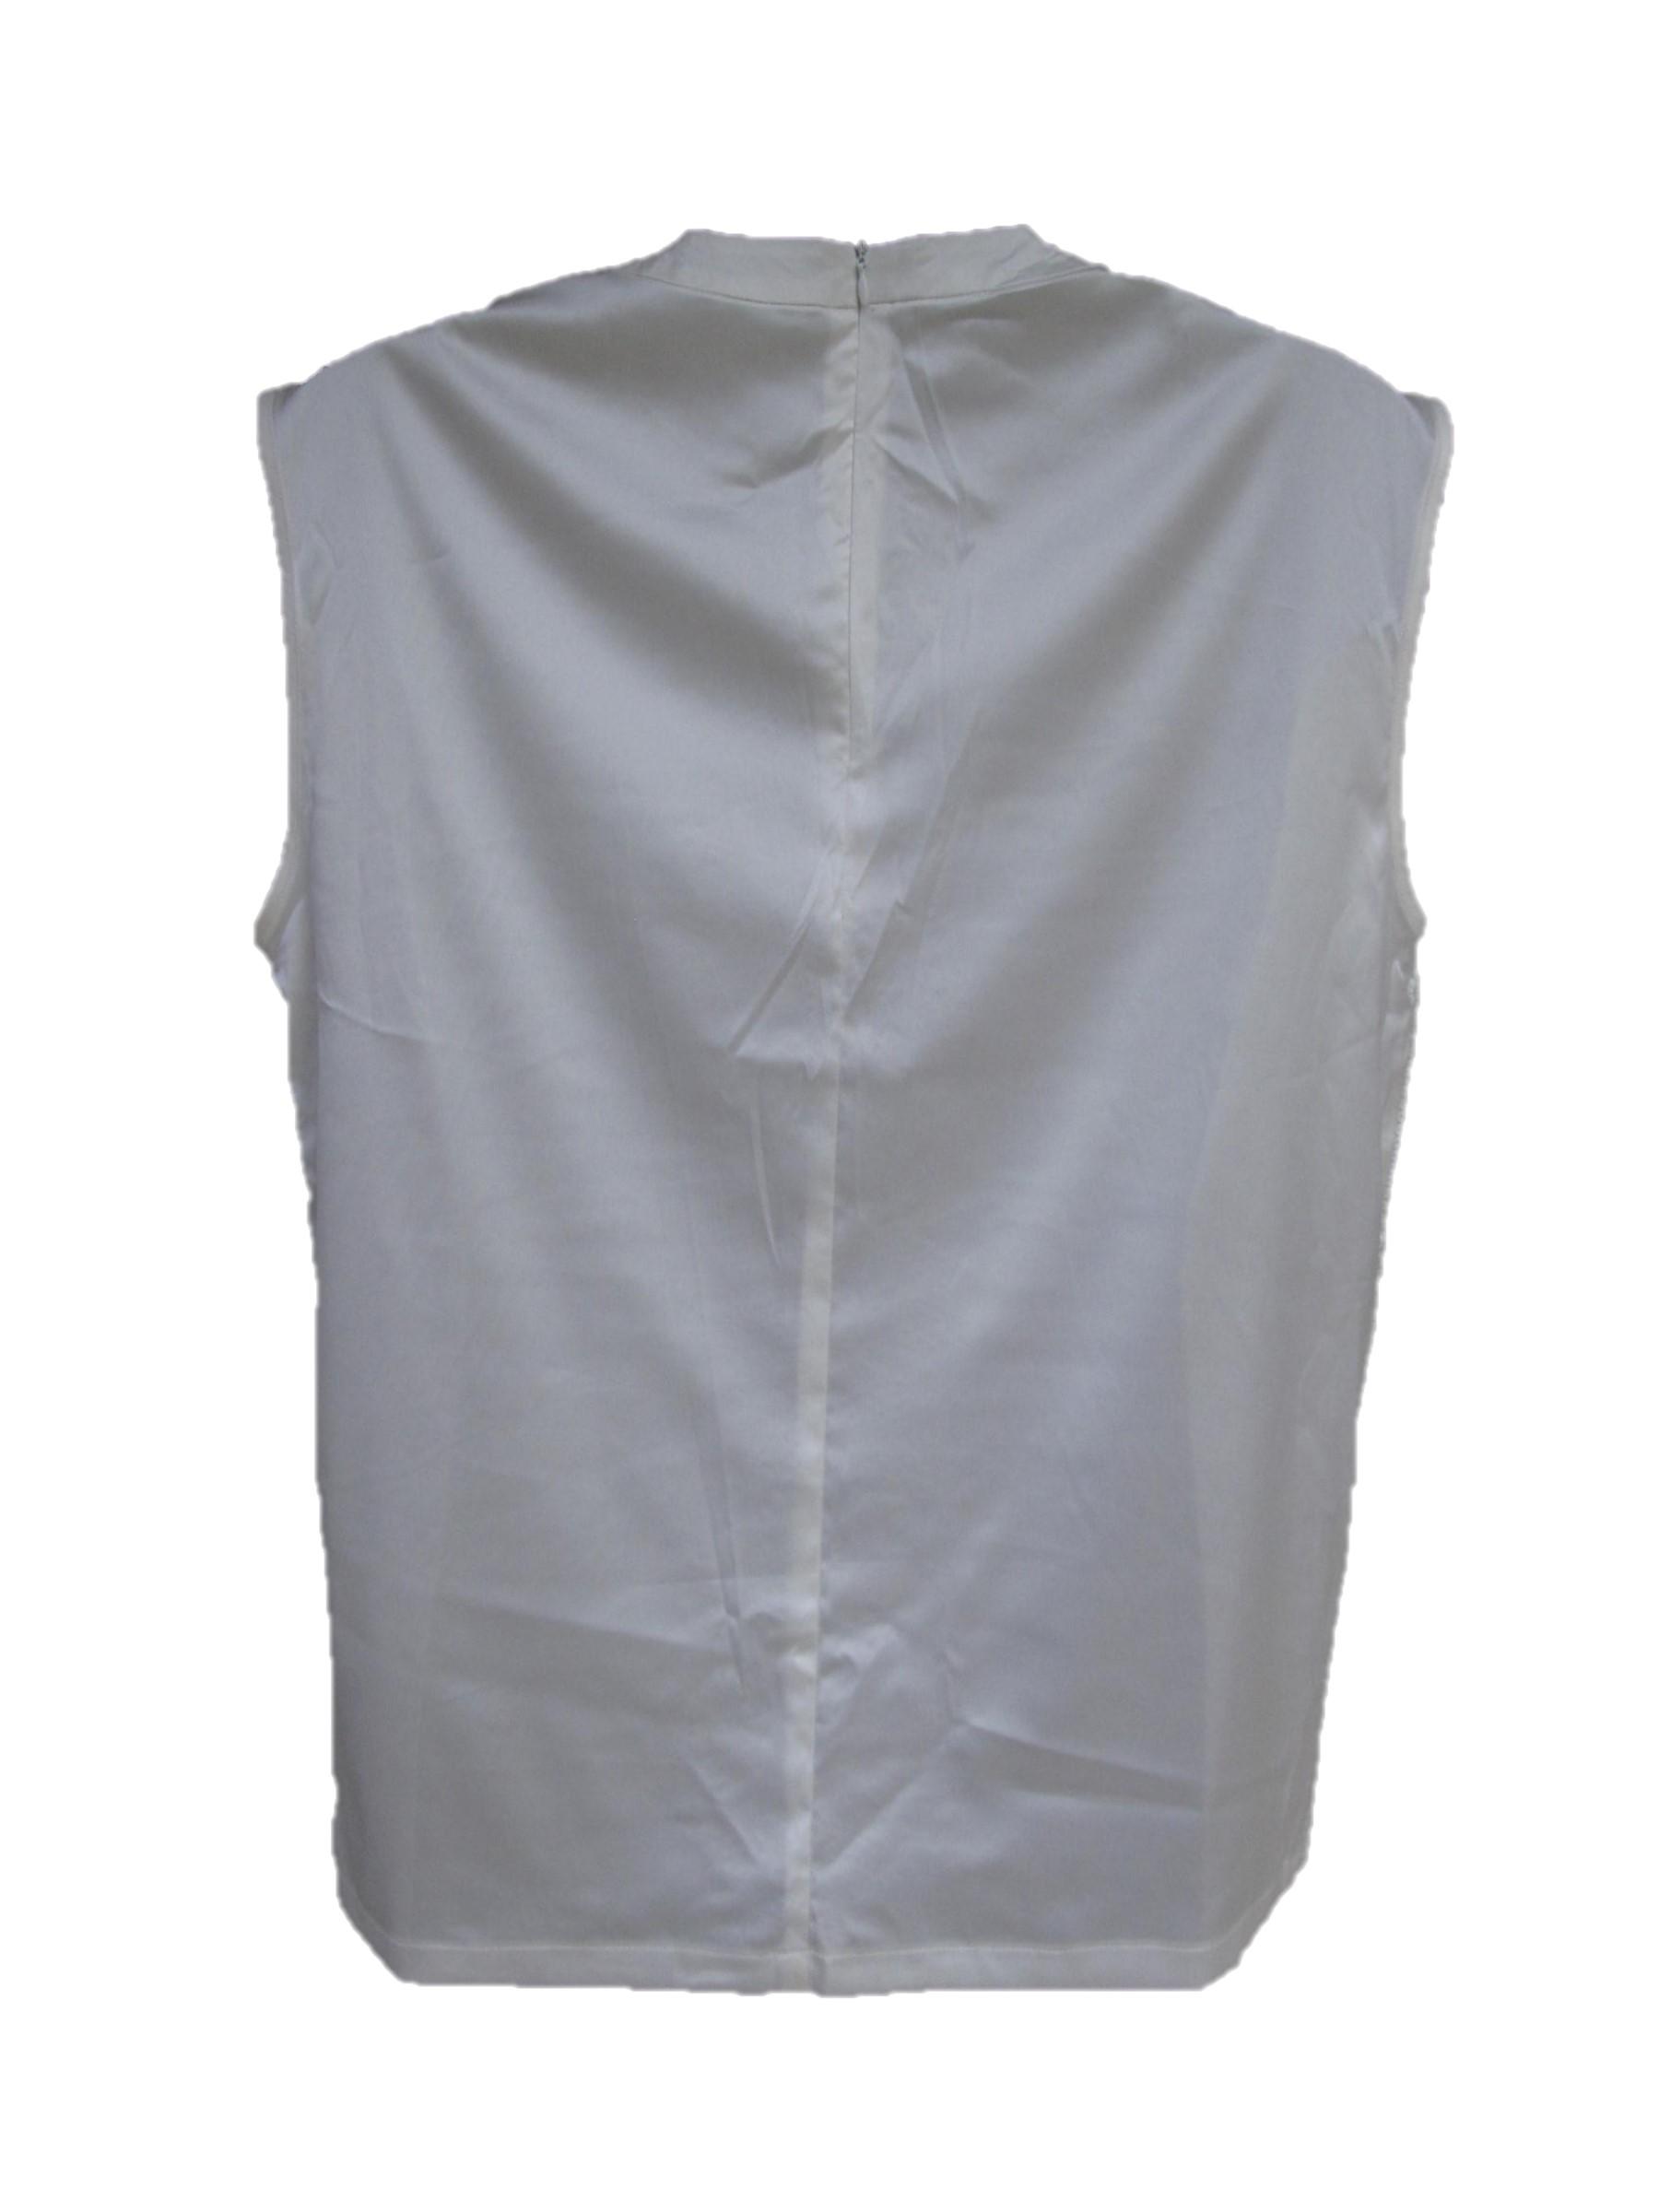 Michael Jackson Victory Tour White Sequins Shirt